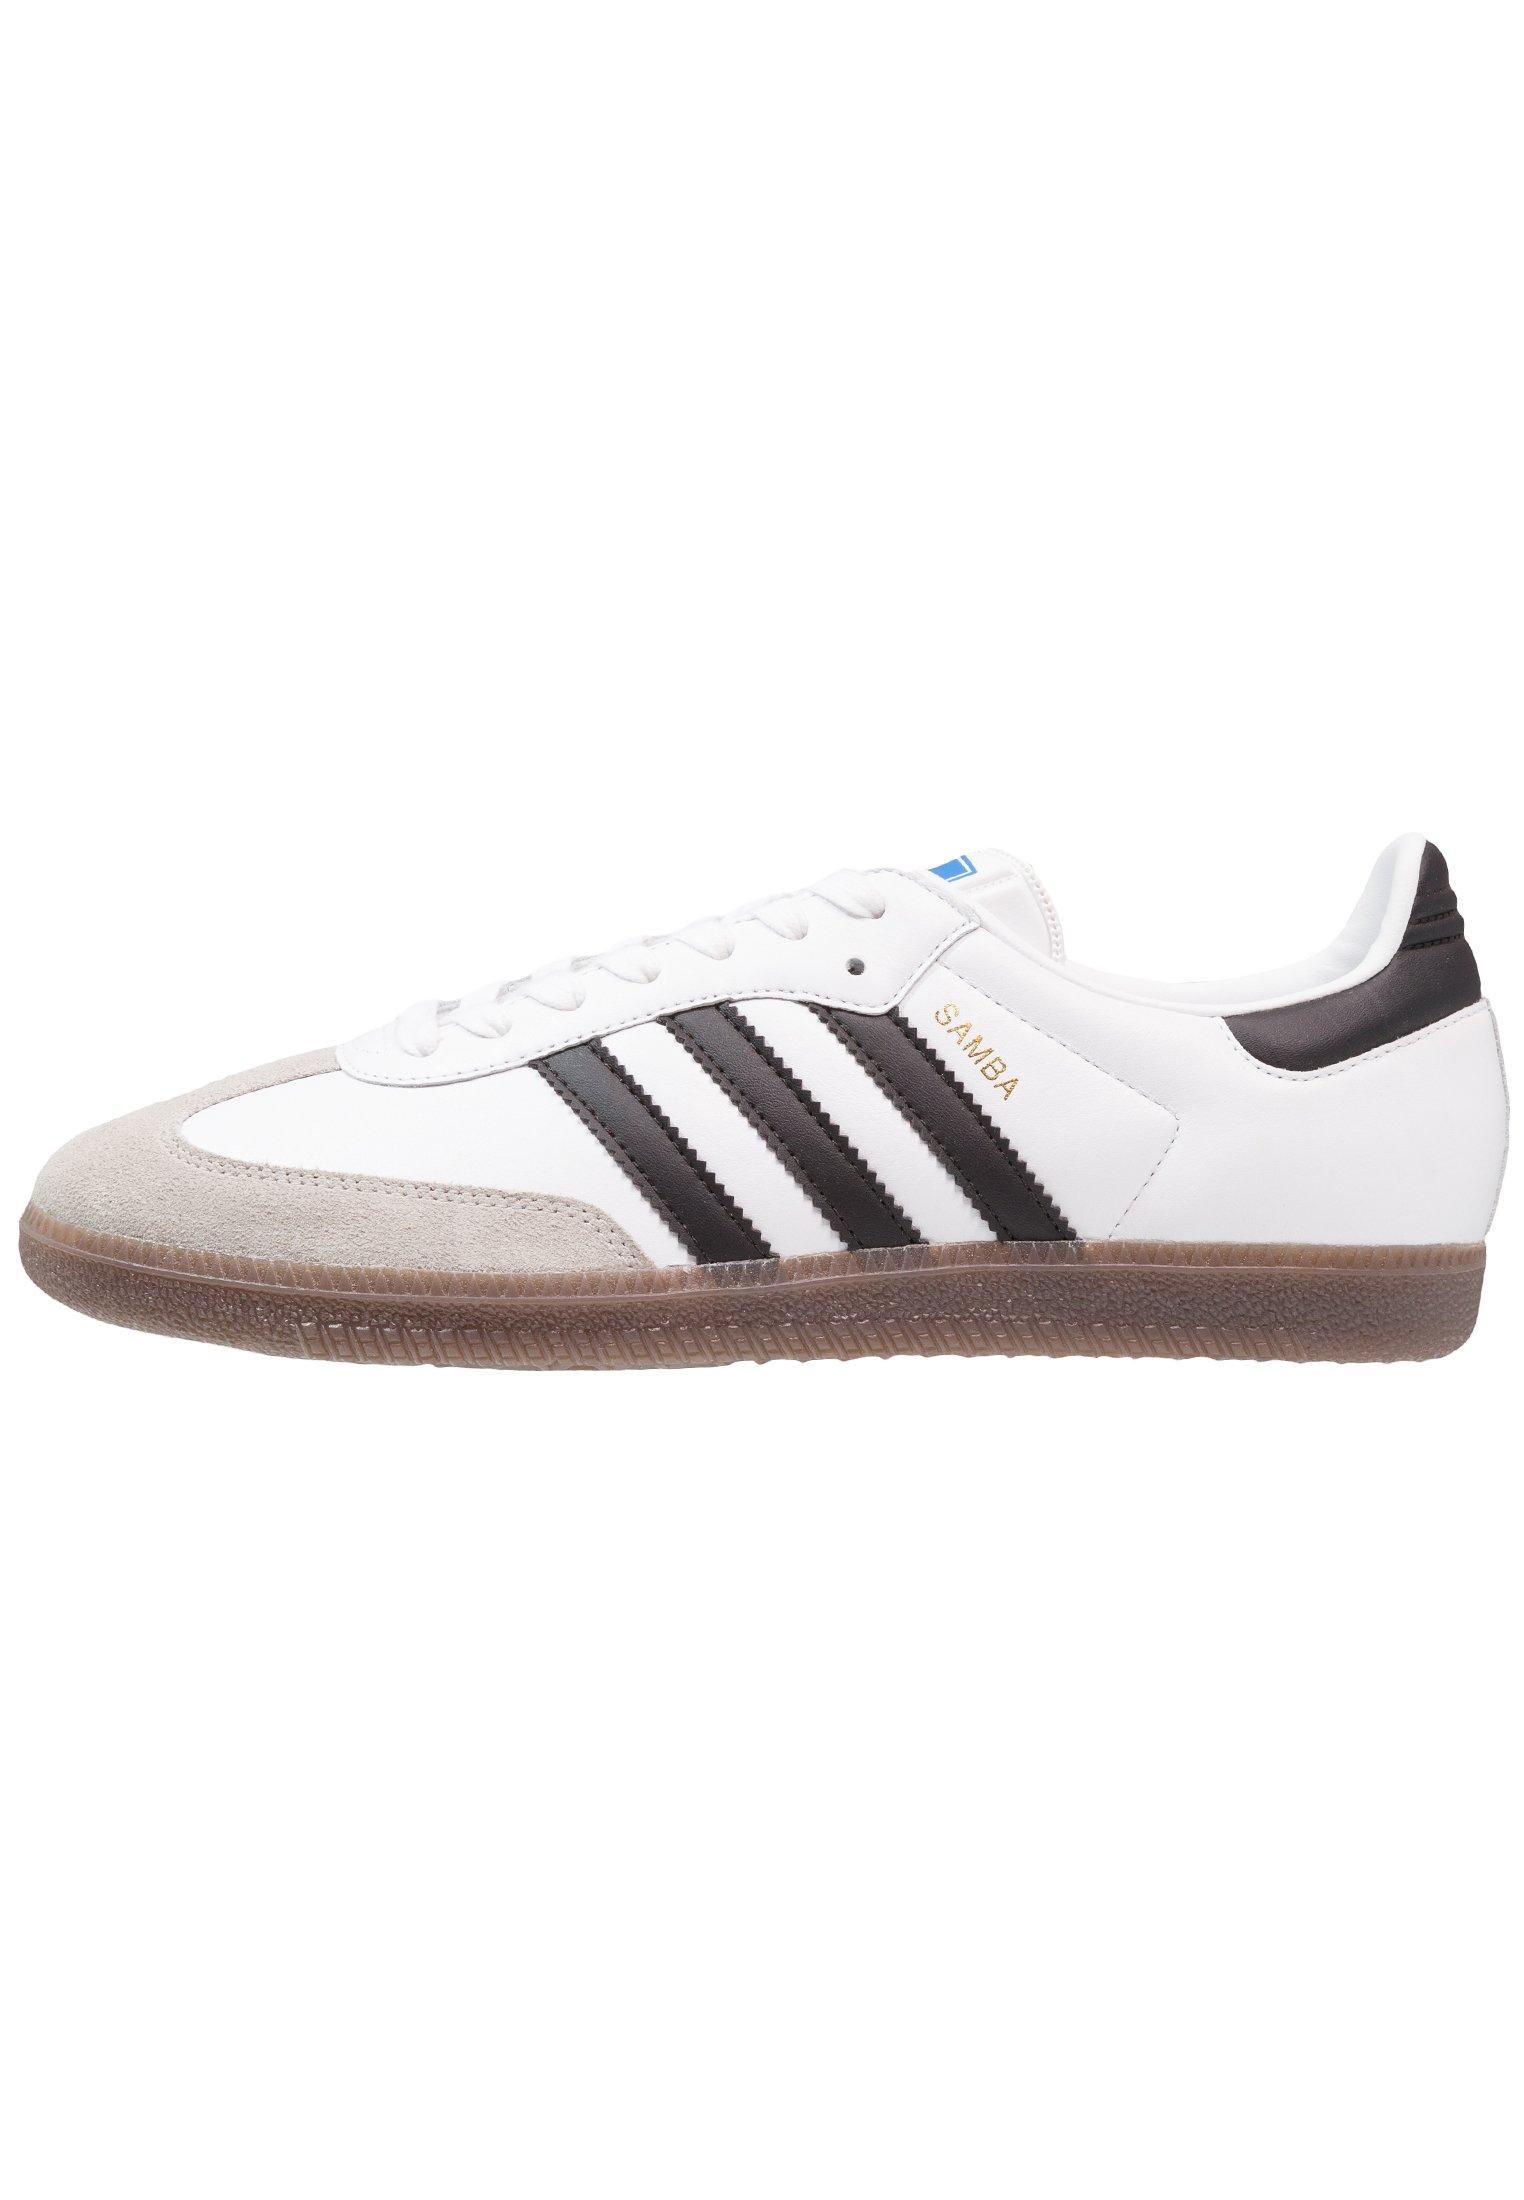 SAMBA OG Sneakers footwear whitecore blackclear granite